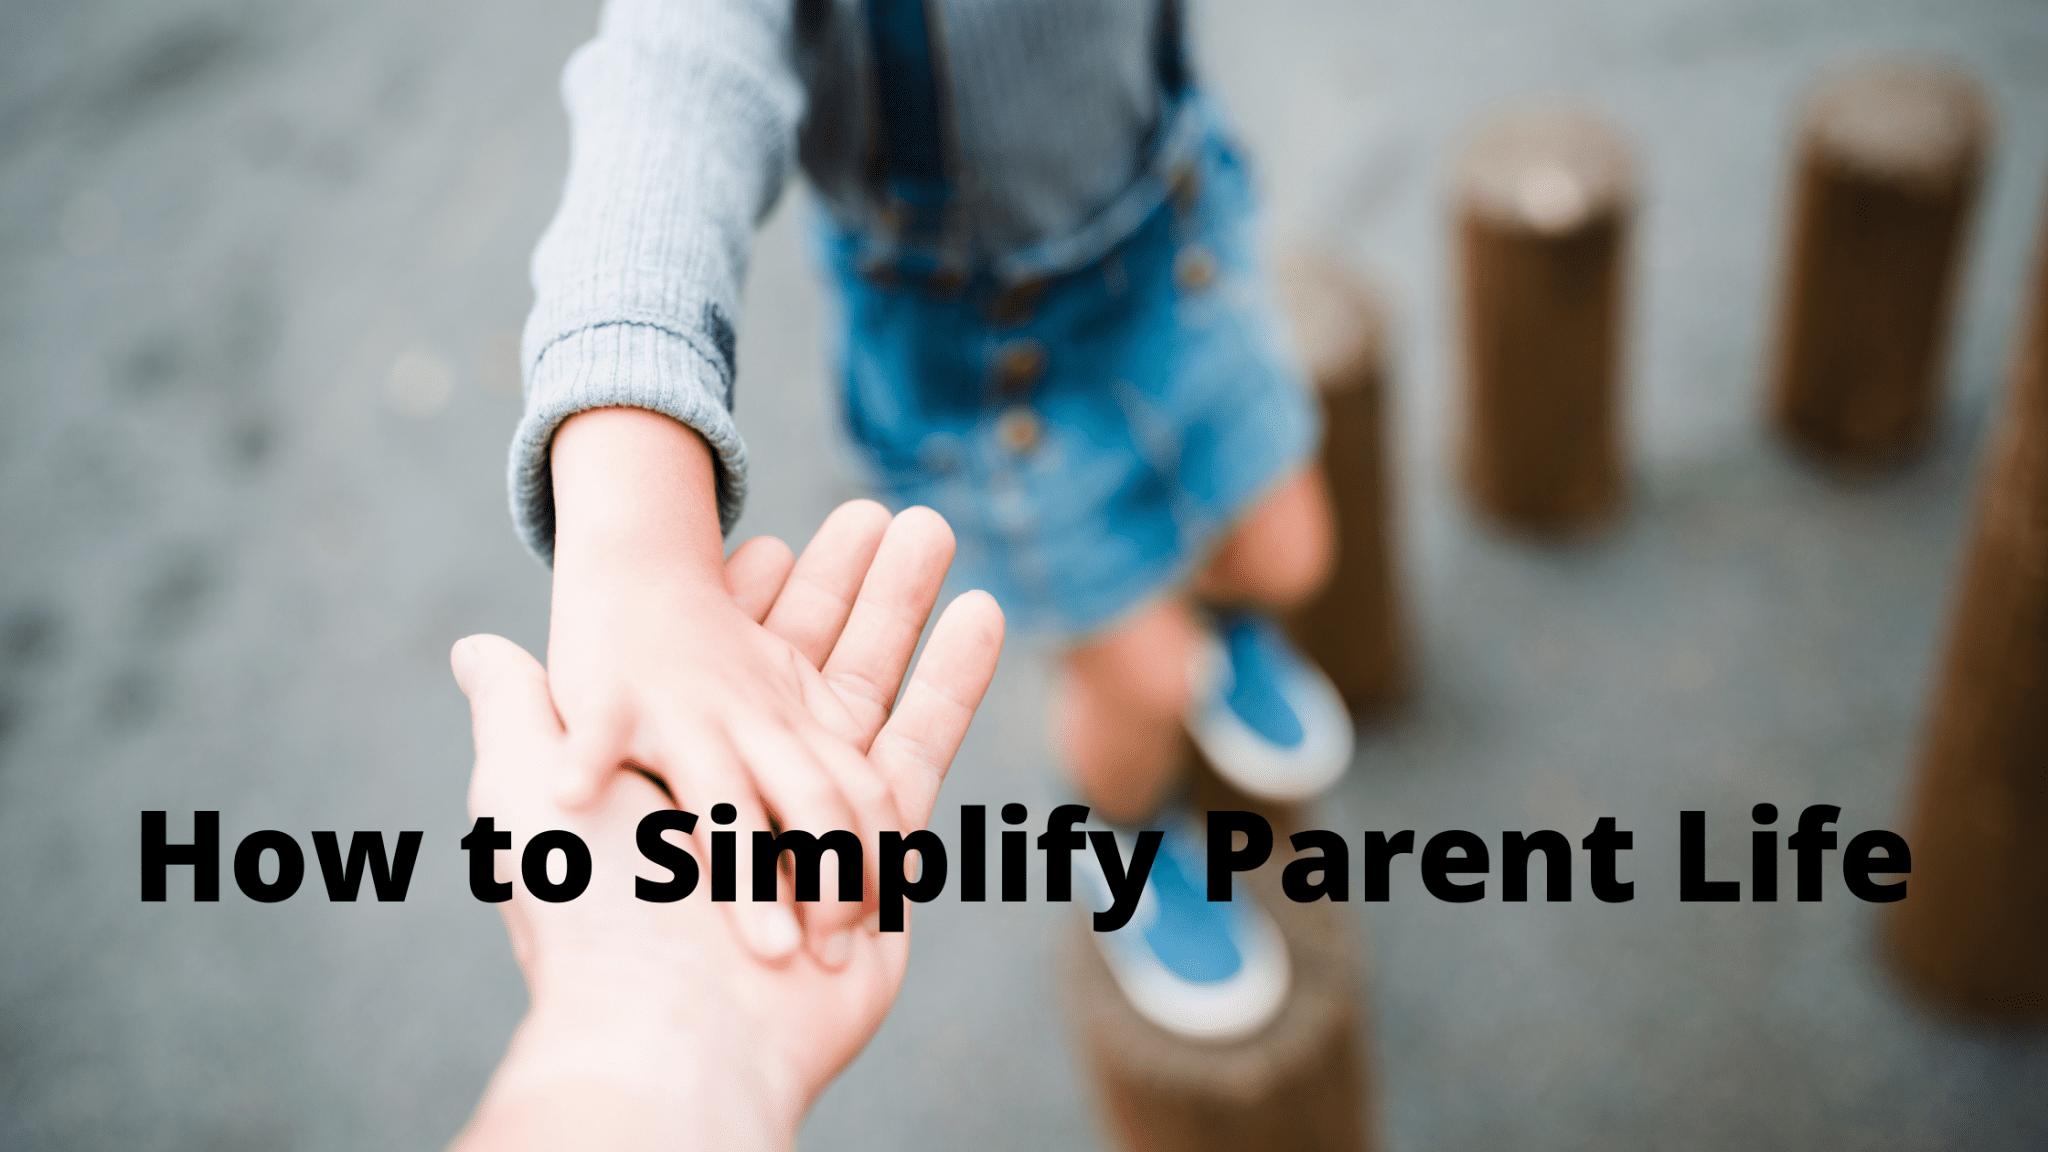 How to Simplify Parent Life